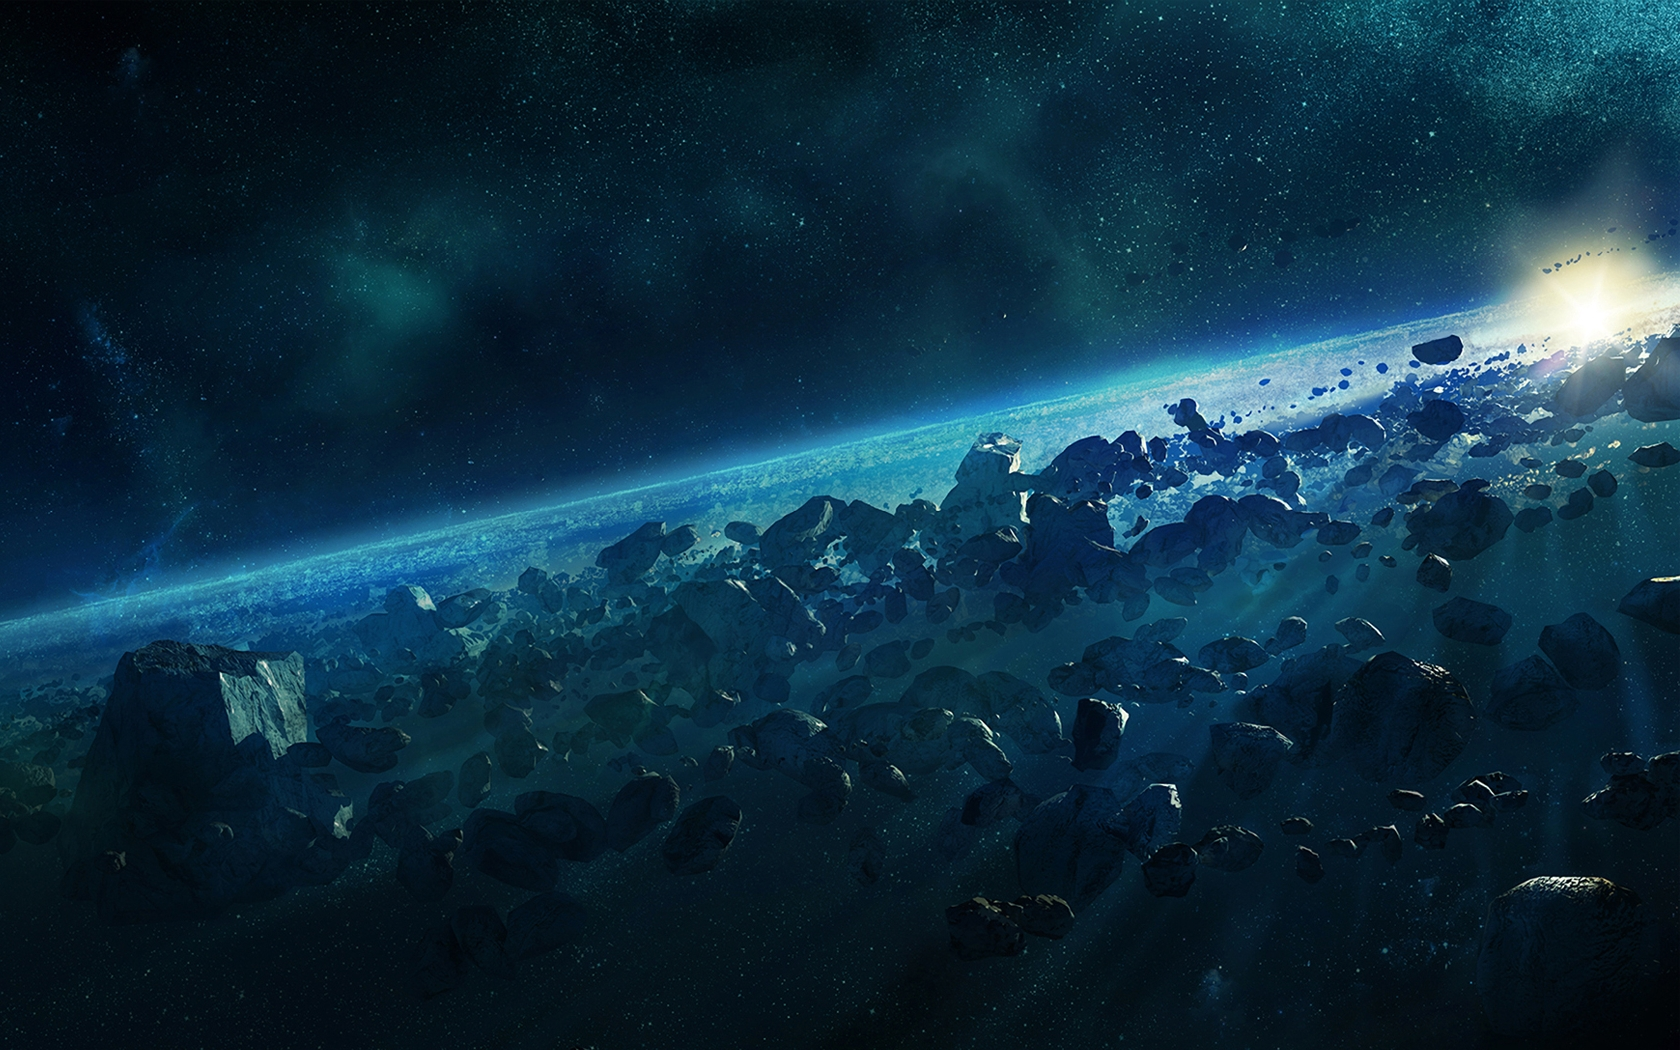 Sf小惑星帯 最高の壁紙17 1680x1050 Wallpapertip